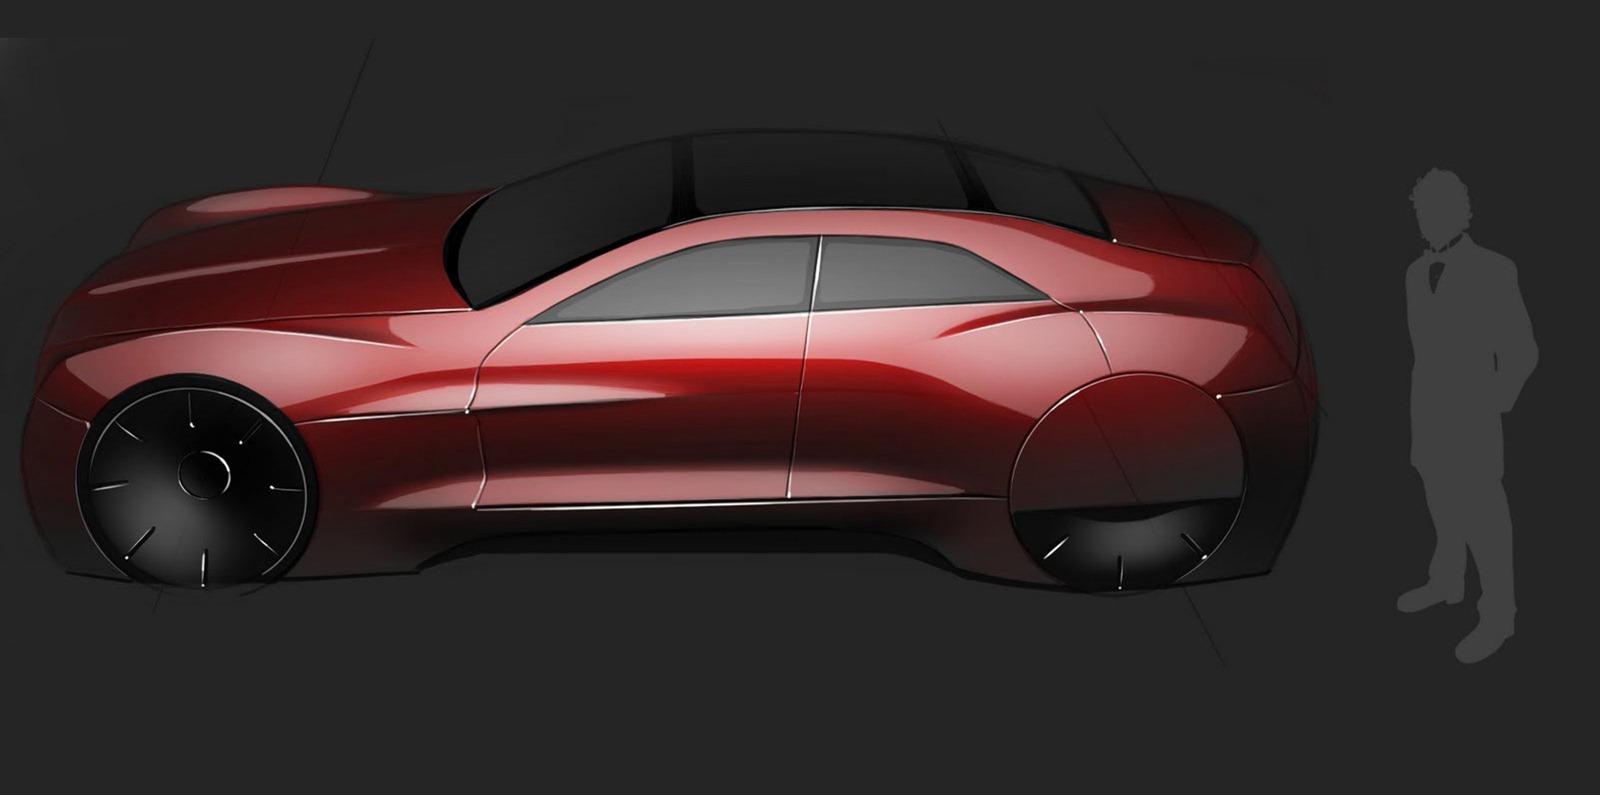 2025 lincoln continental concept photo gallery autoevolution. Black Bedroom Furniture Sets. Home Design Ideas